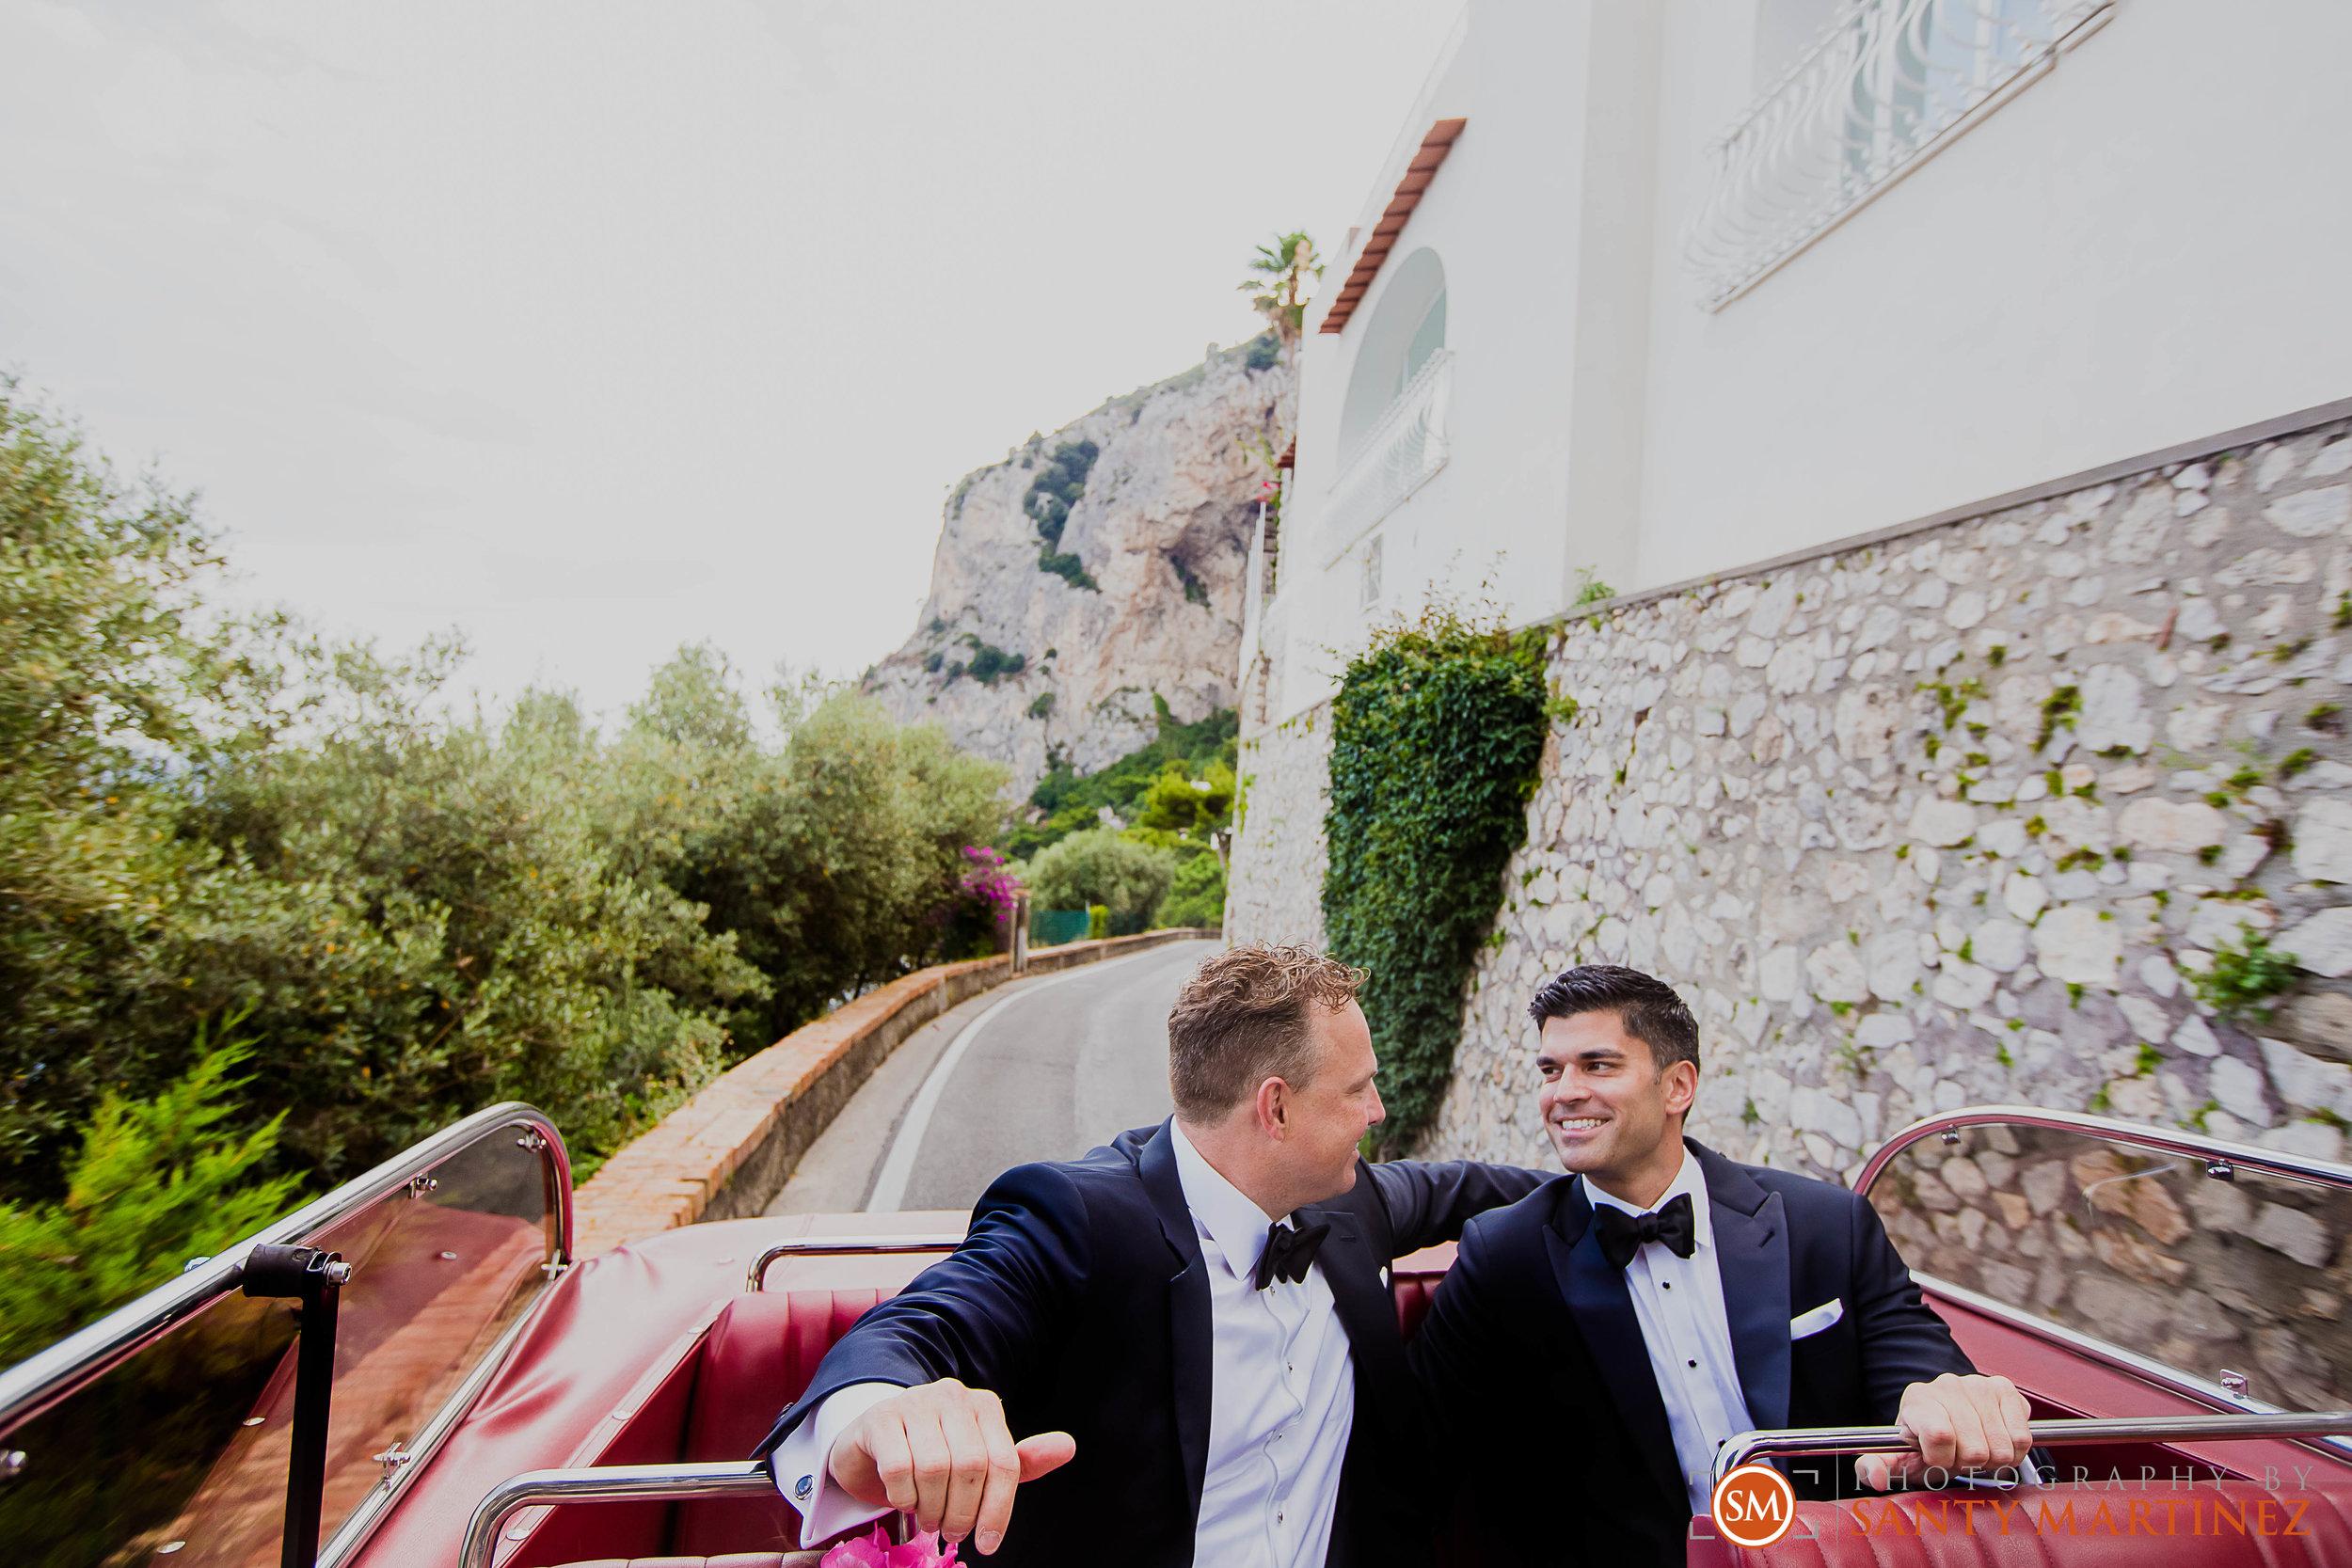 Wedding Capri Italy - Photography by Santy Martinez-27.jpg